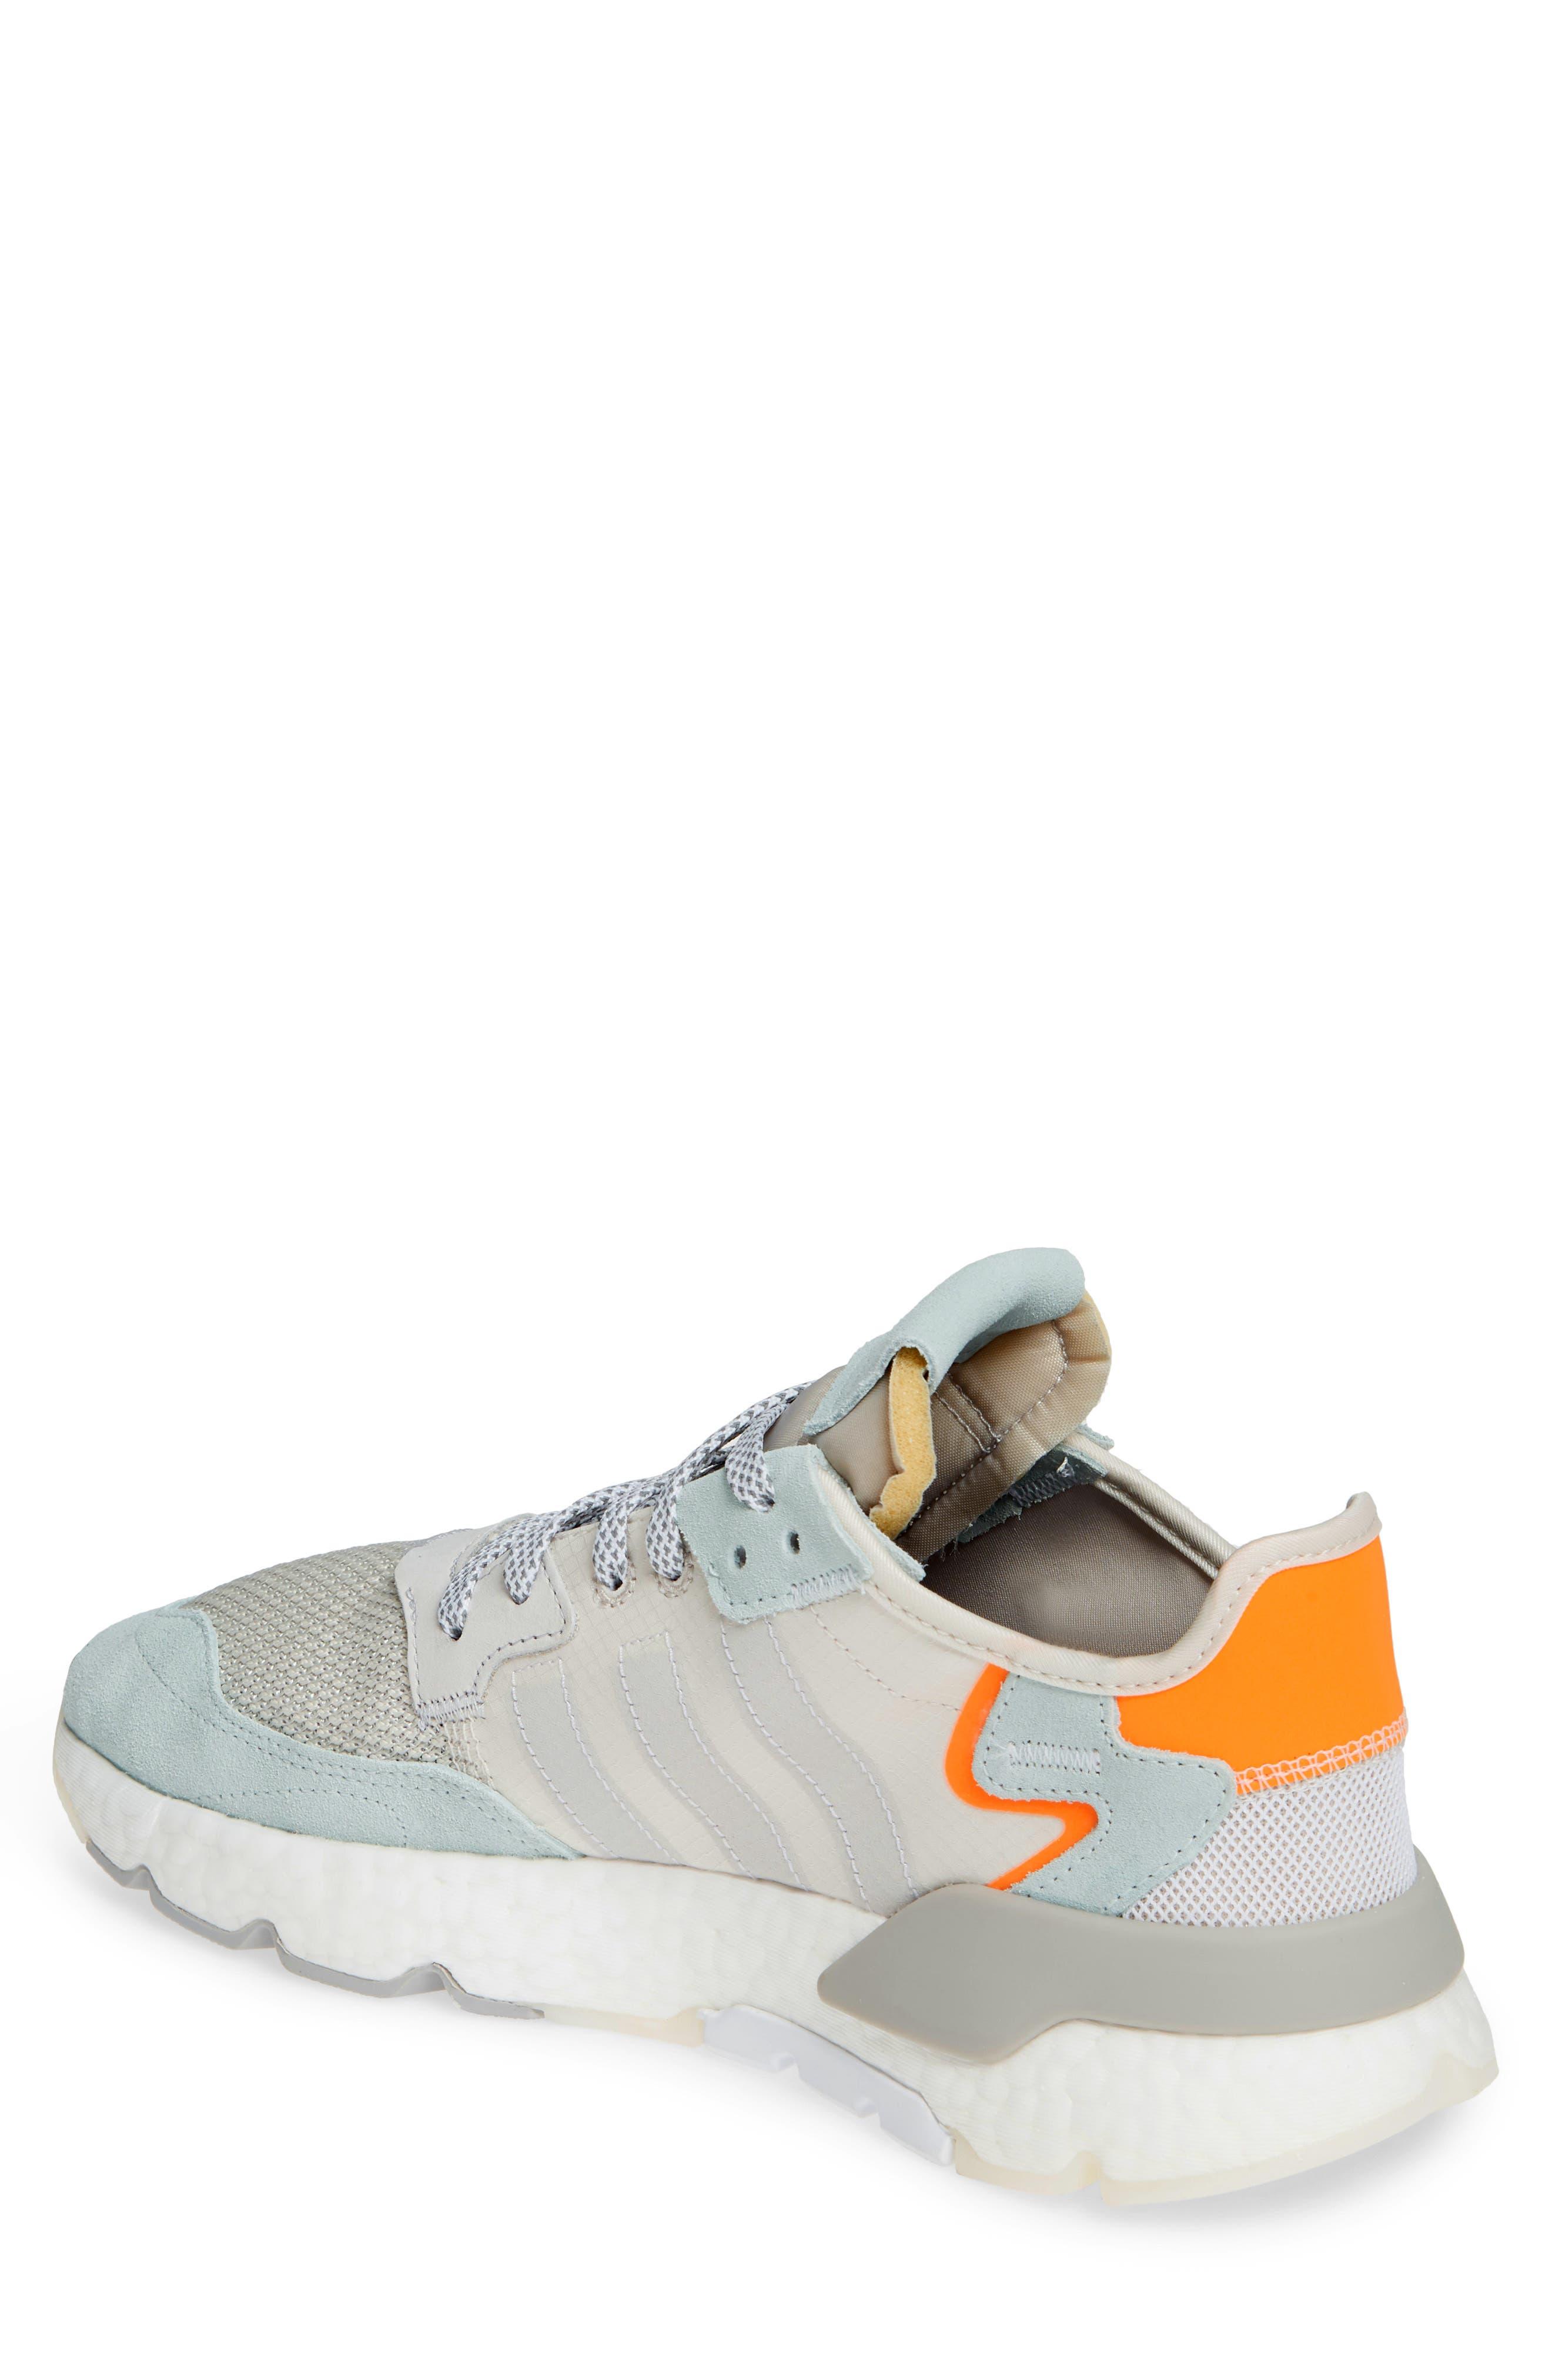 ADIDAS, Nite Jogger Sneaker, Alternate thumbnail 2, color, RAW WHITE/ GREY/ VAPOR GREEN